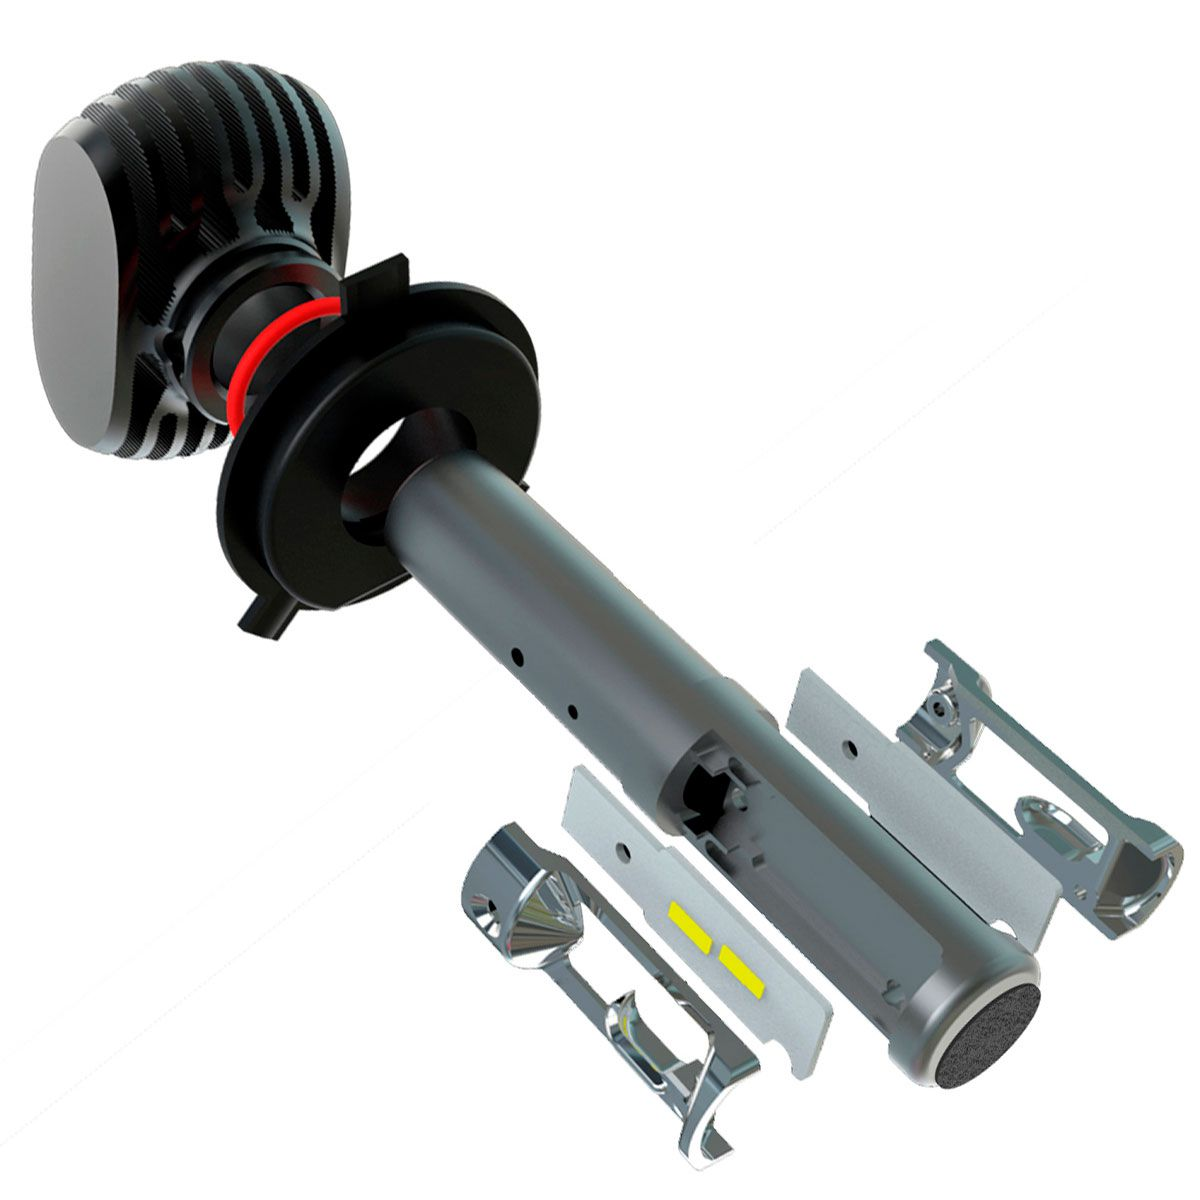 Kit Ultra LED Sandero 2015 2016 2017 2018 2019 2020 tipo xenon farol baixo H7 50W